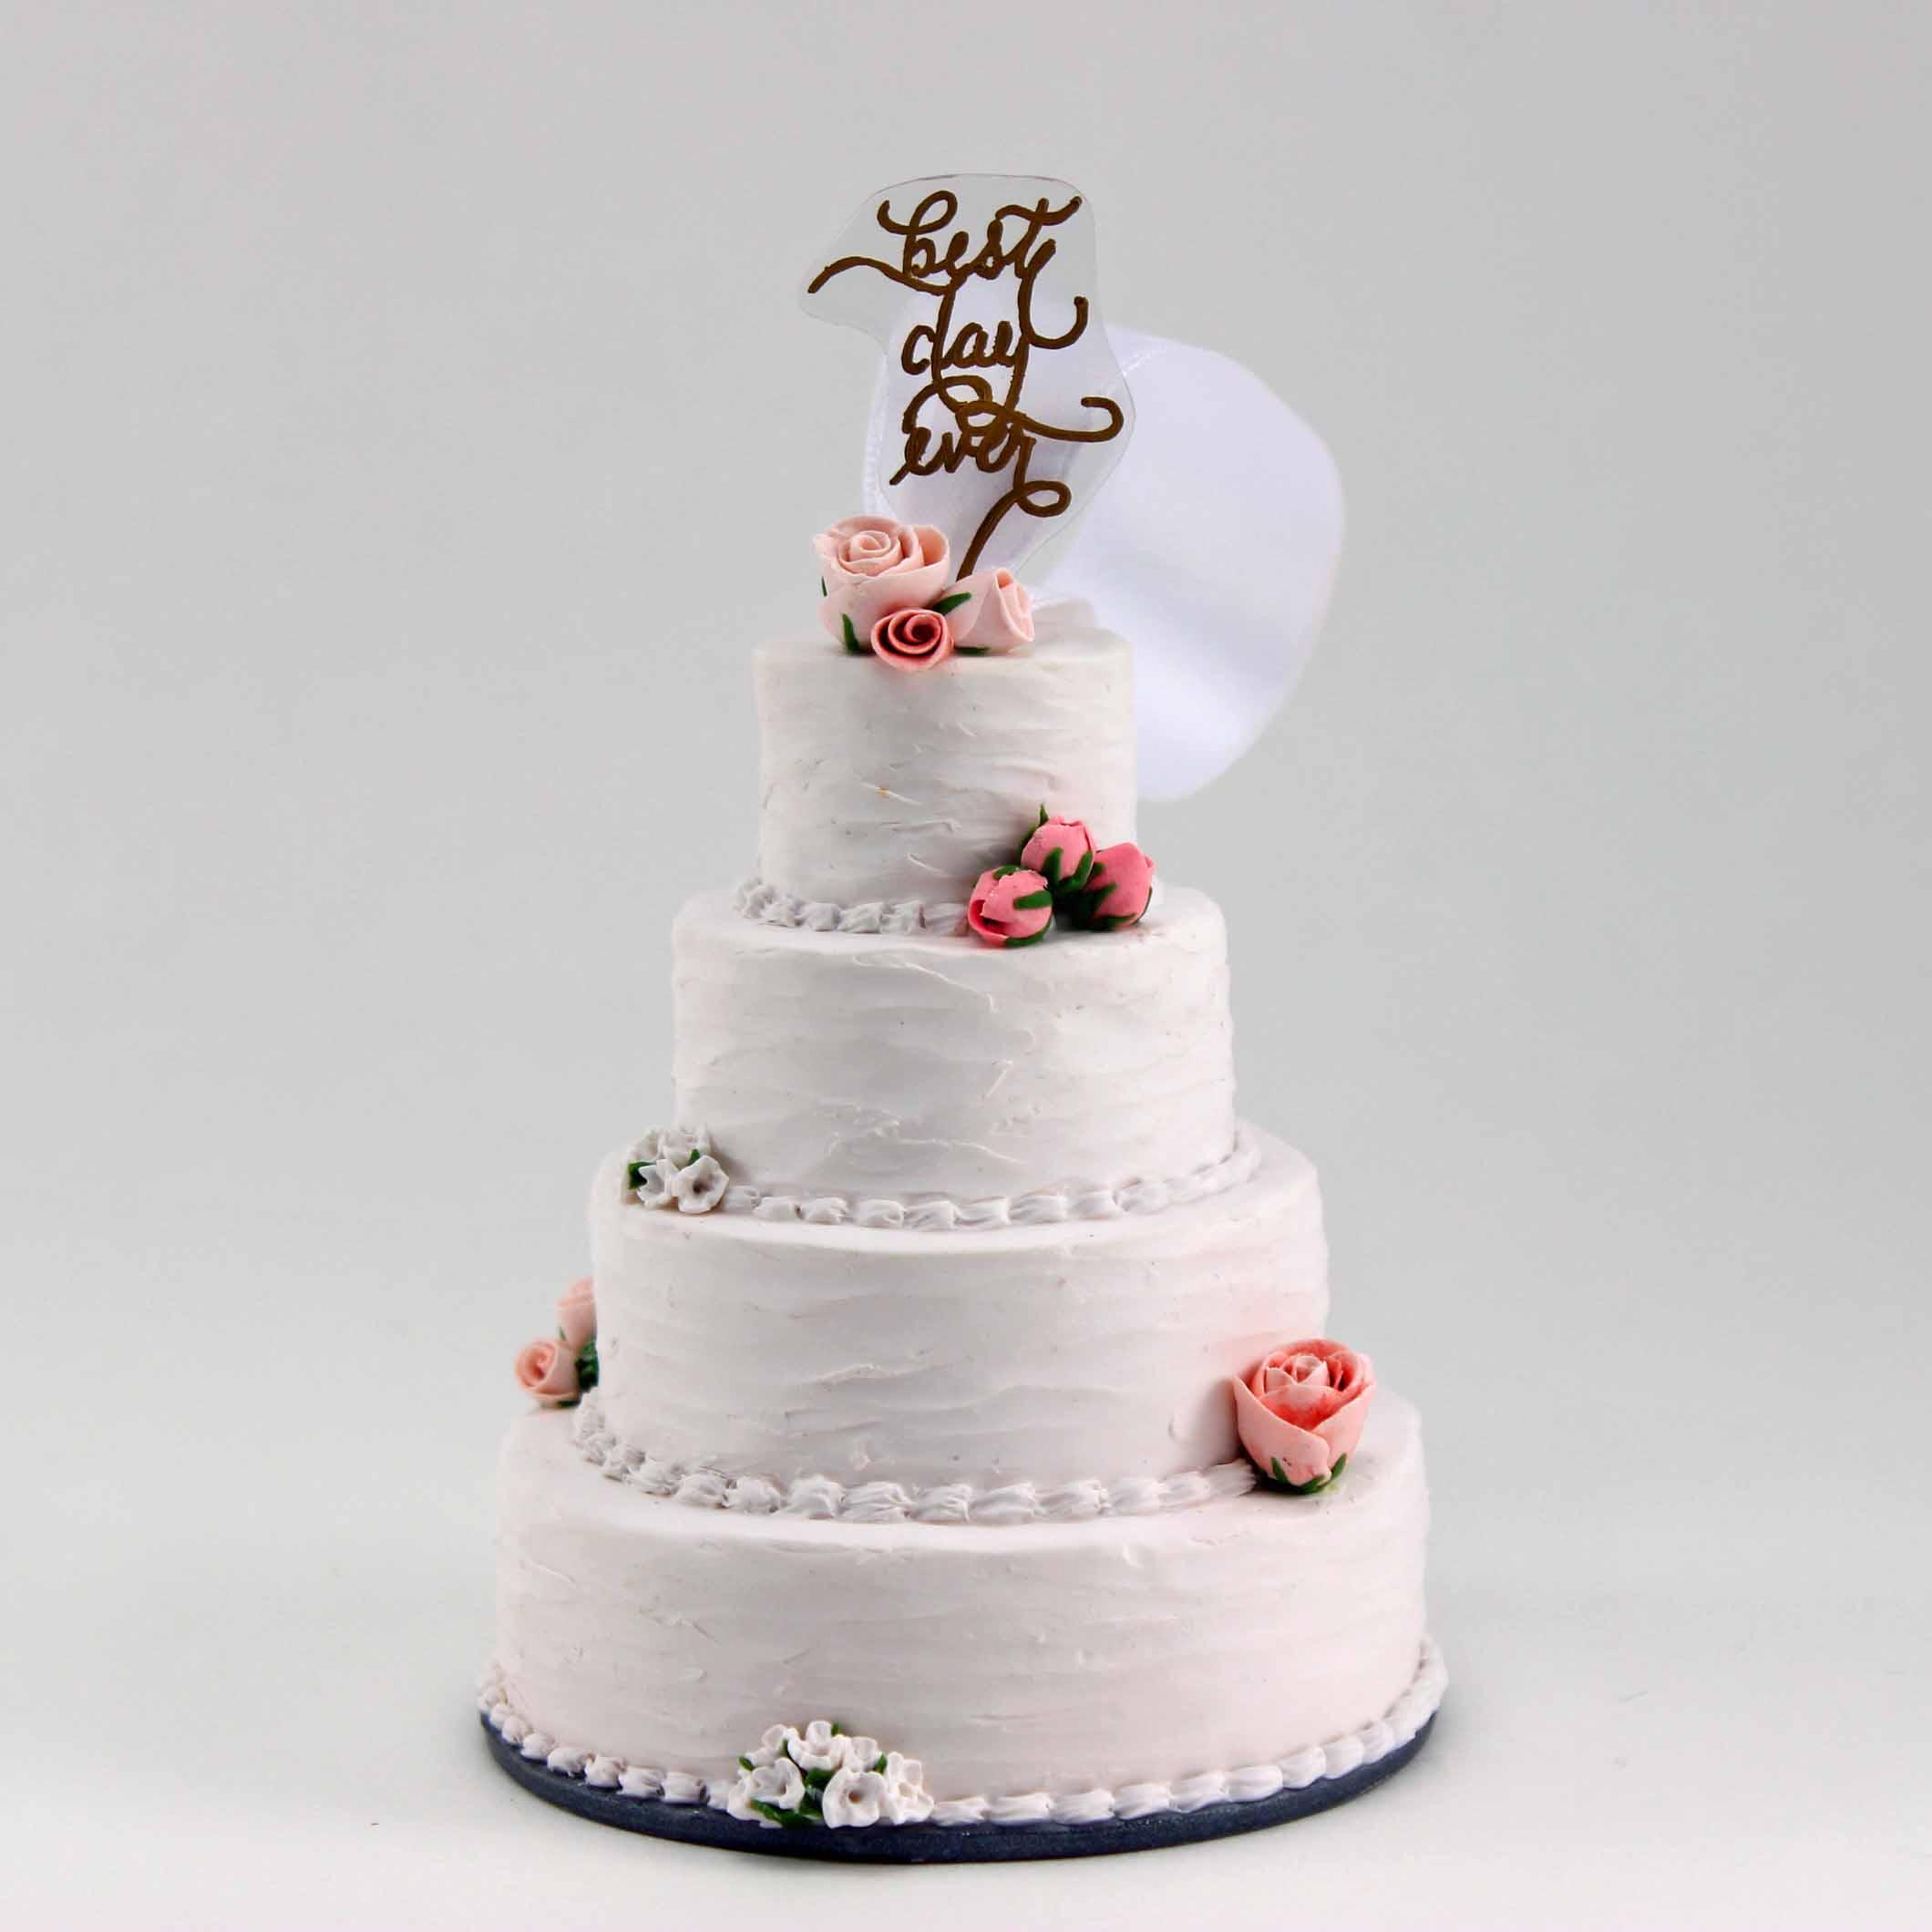 minature replica of best day ever mini wedding cake.jpg